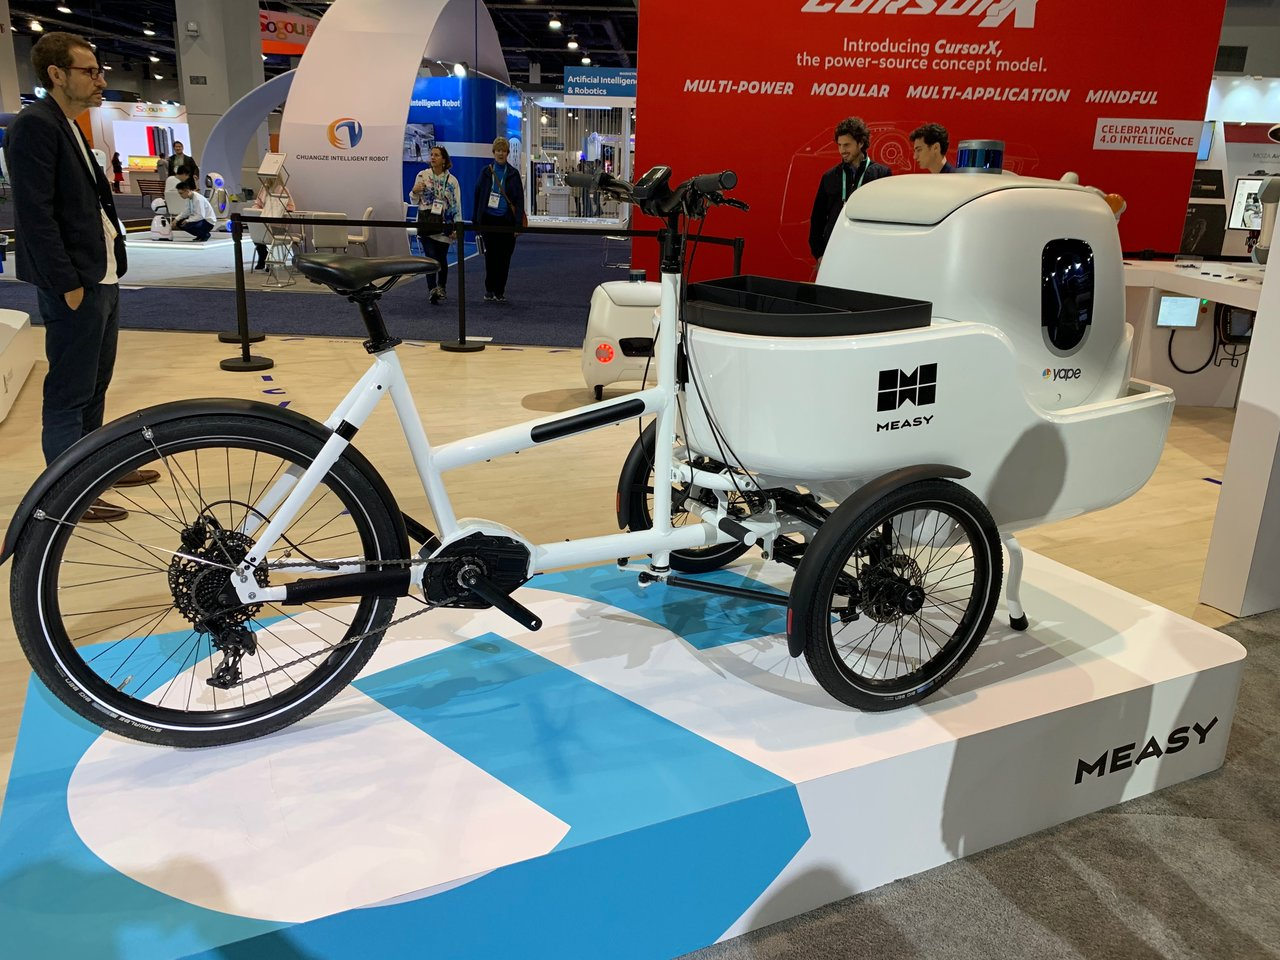 e-noviaが展示した運搬能力を持った電動バイク